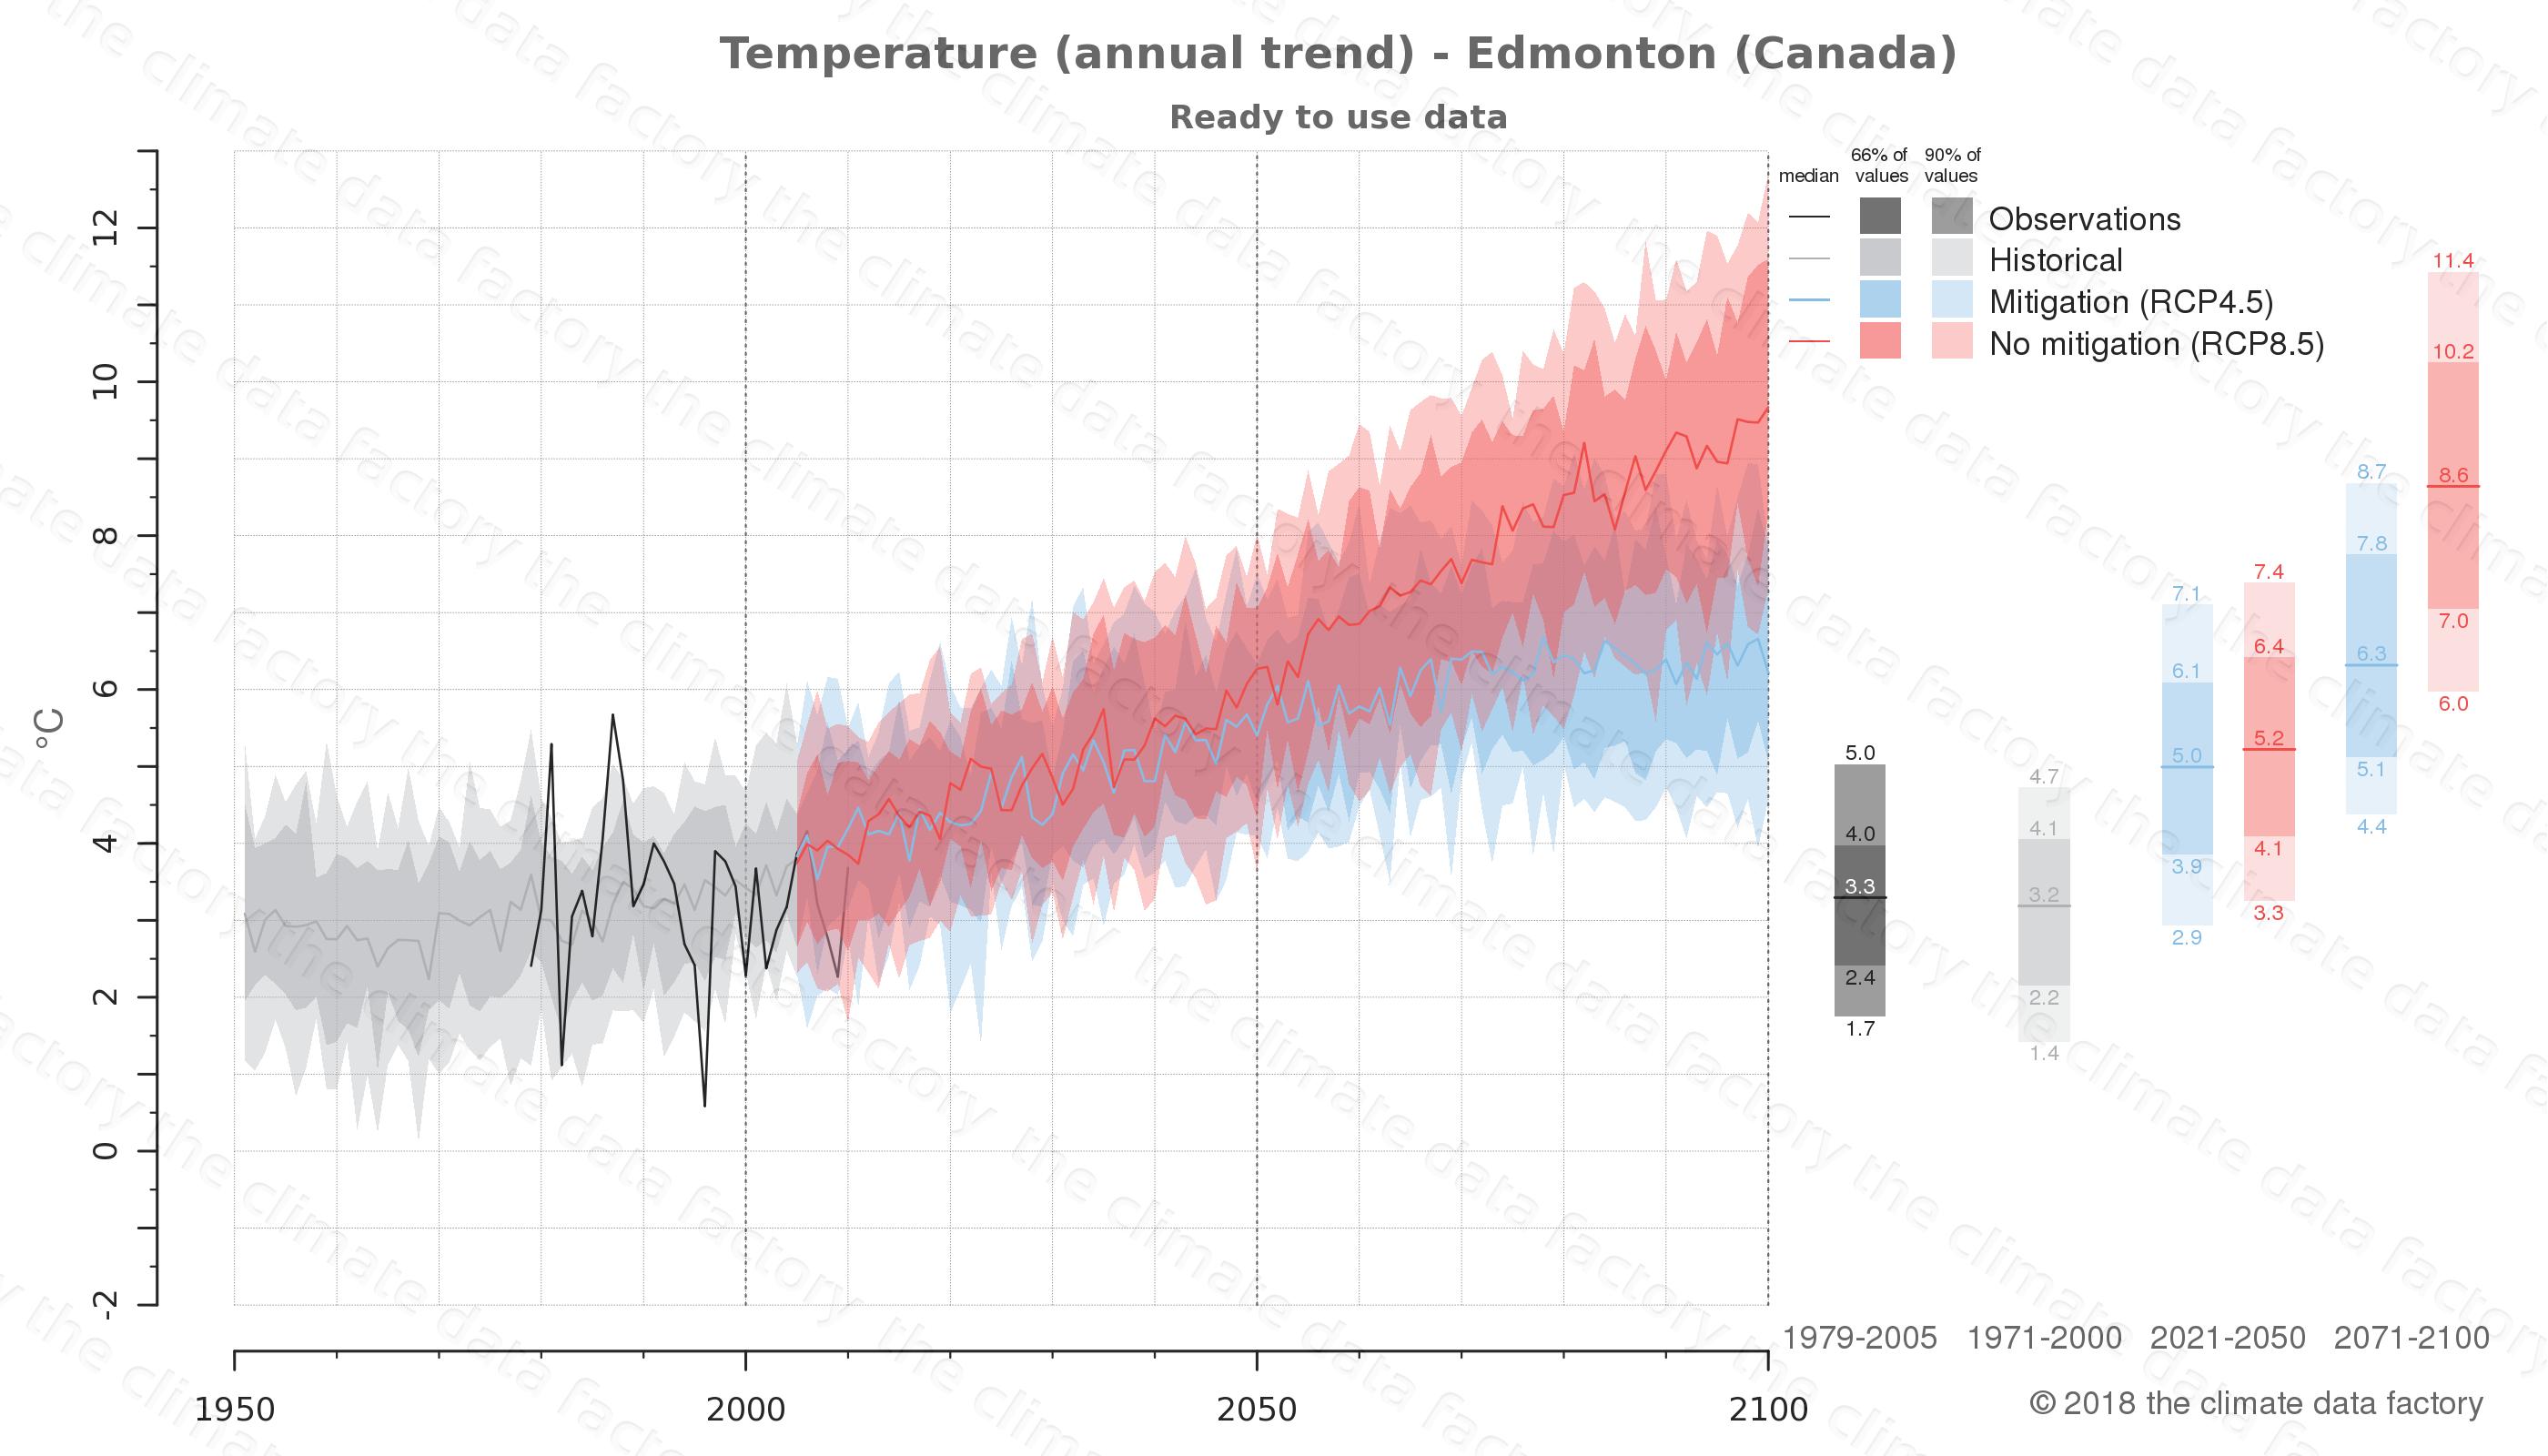 climate change data policy adaptation climate graph city data temperature edmonton canada